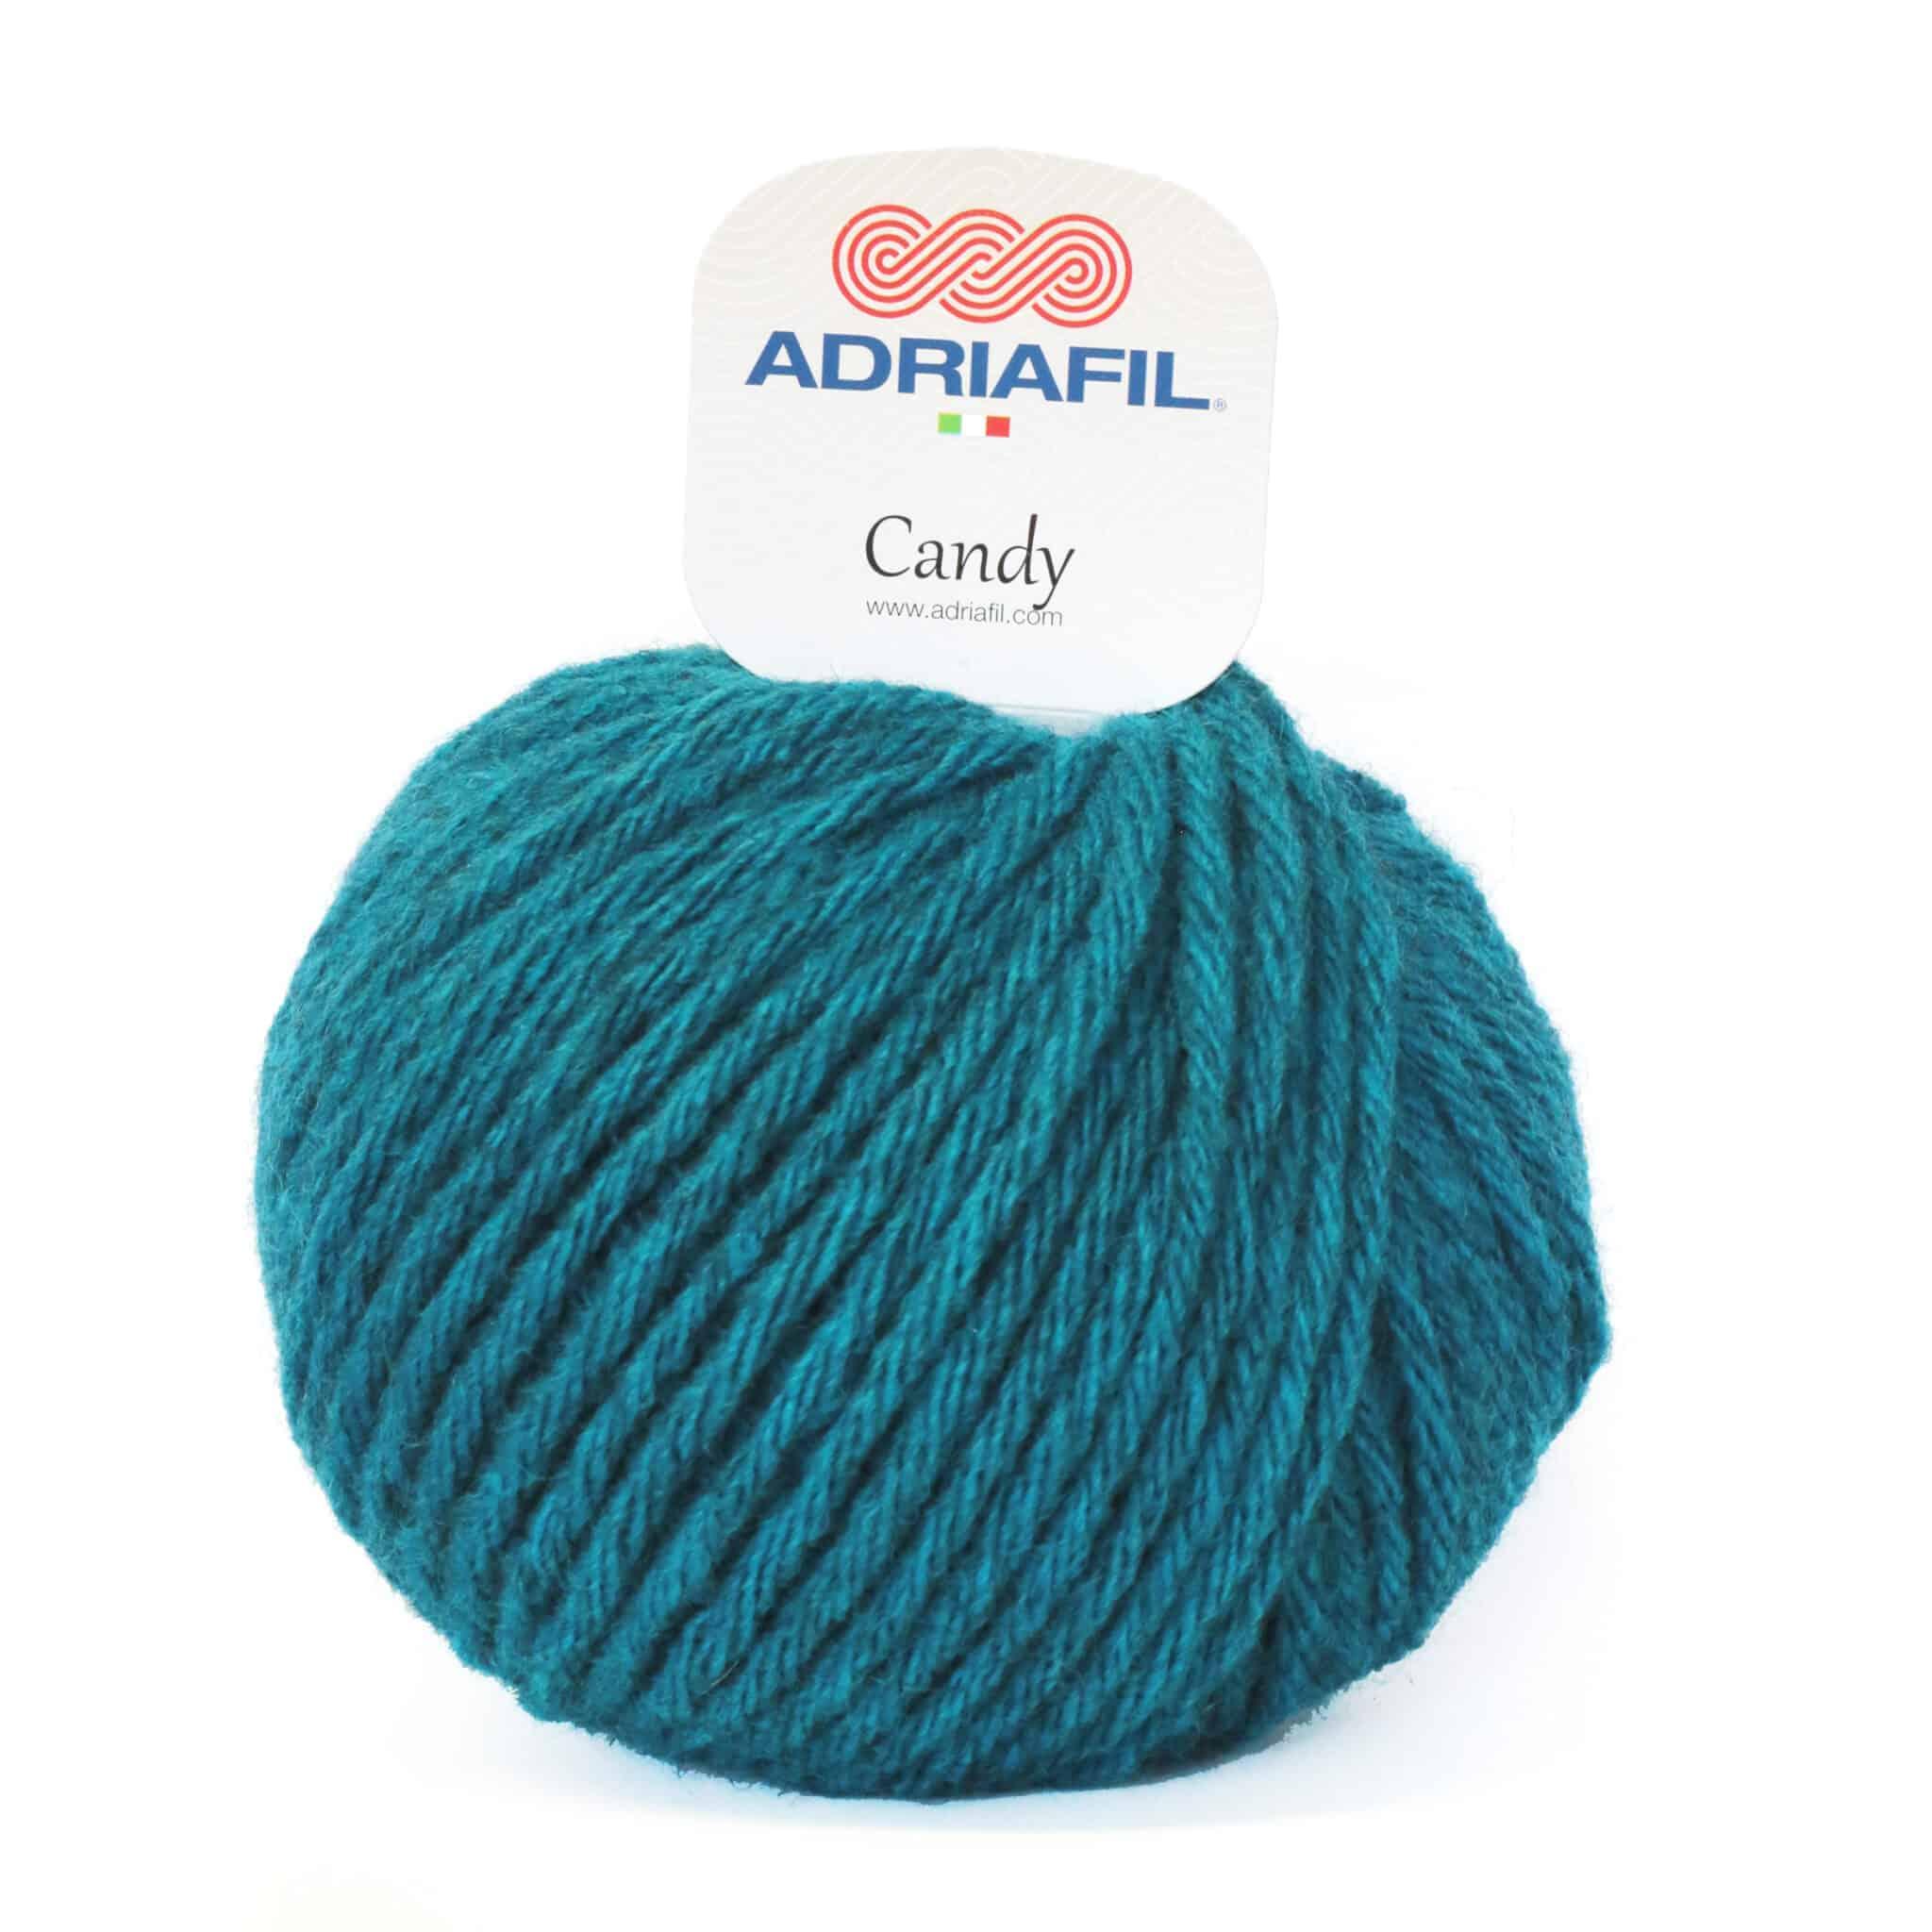 Adriafil Candy #51 Teal